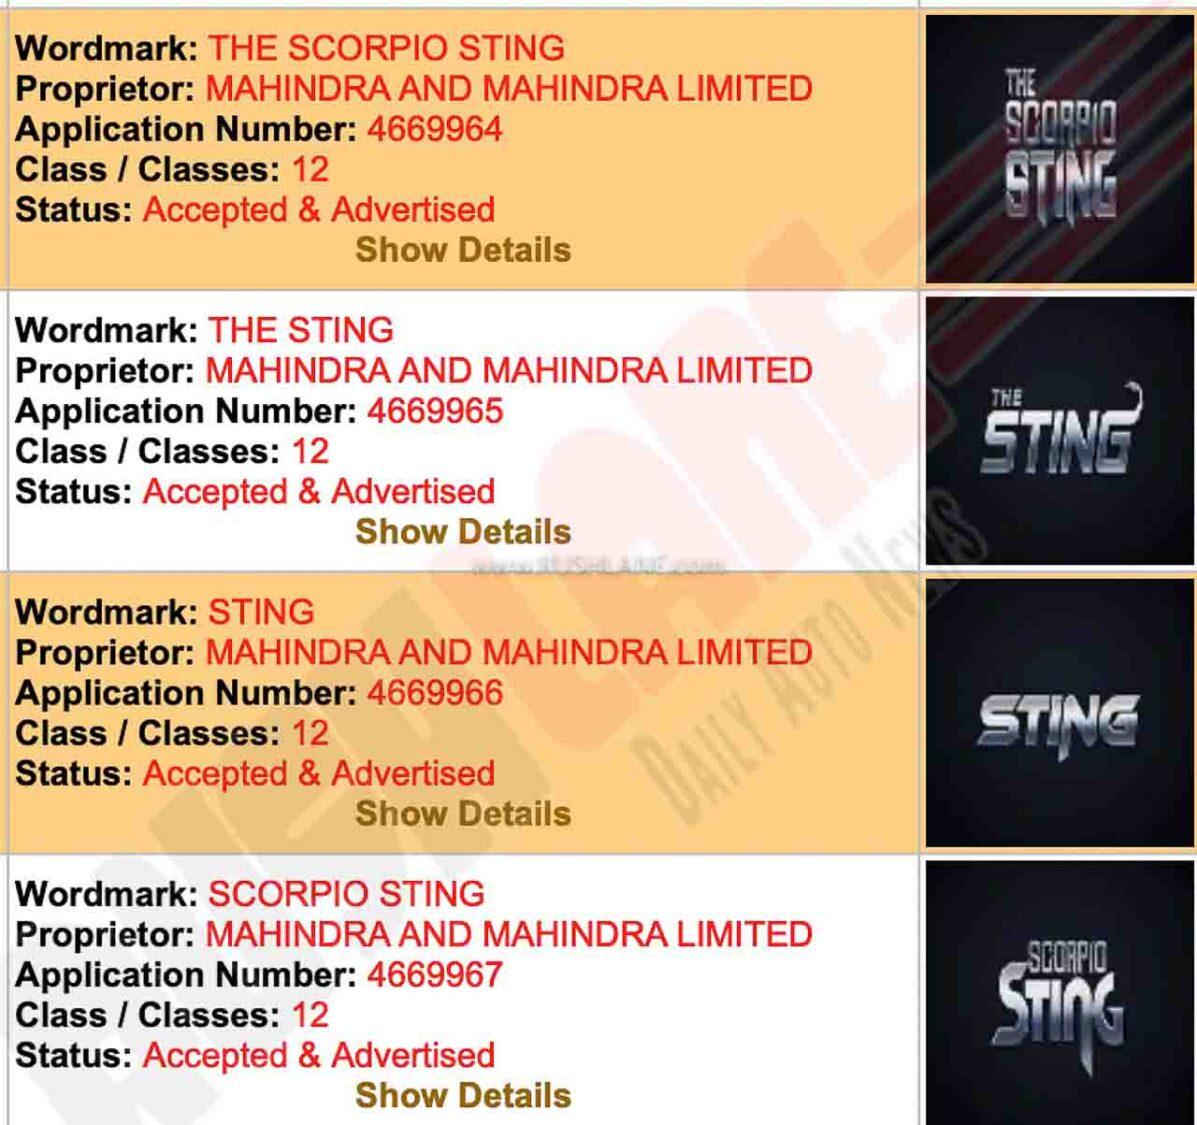 Mahindra Scorpio Sting Name Registered